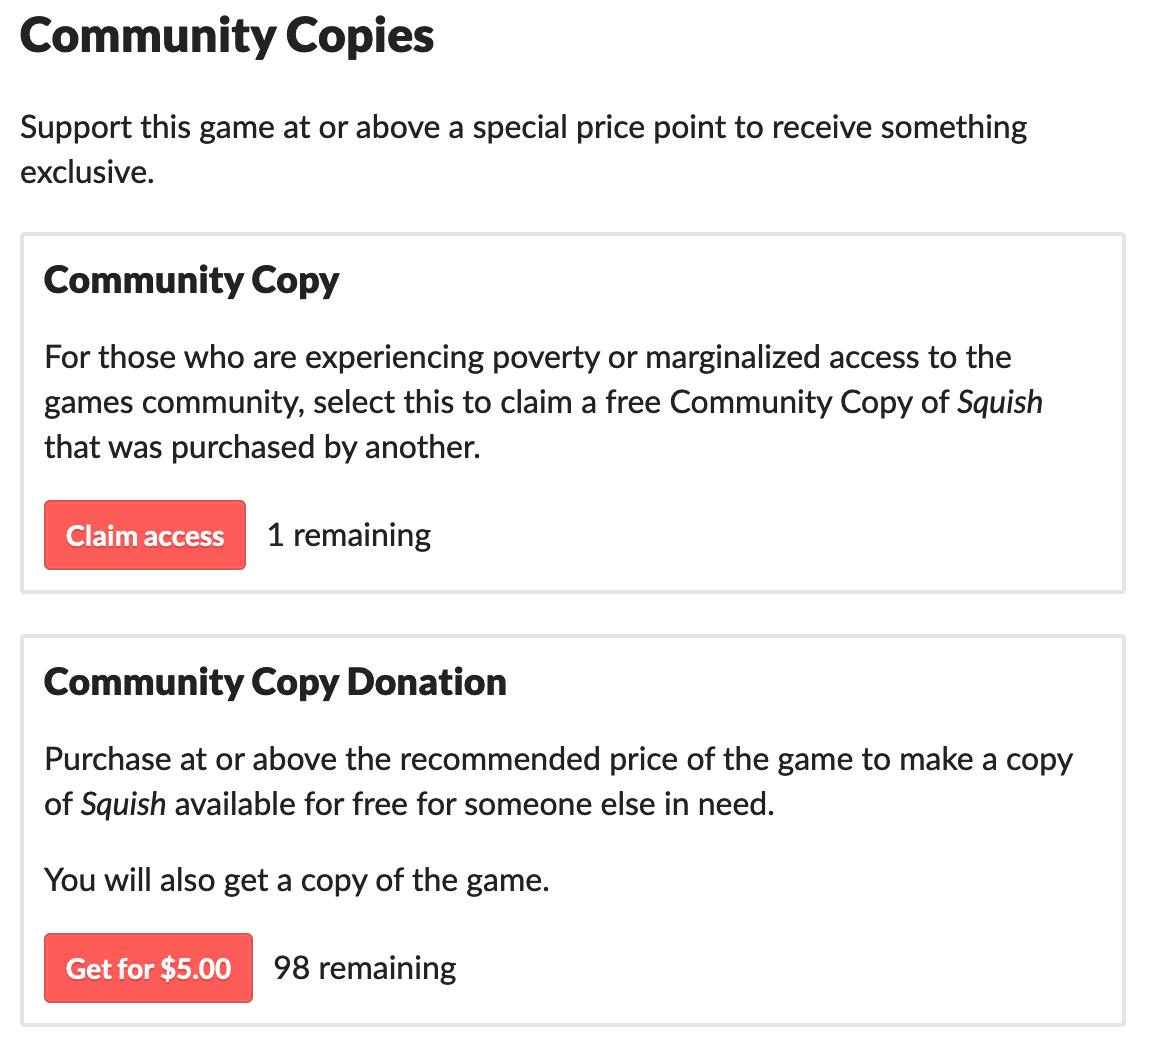 01_Community_Copies.png